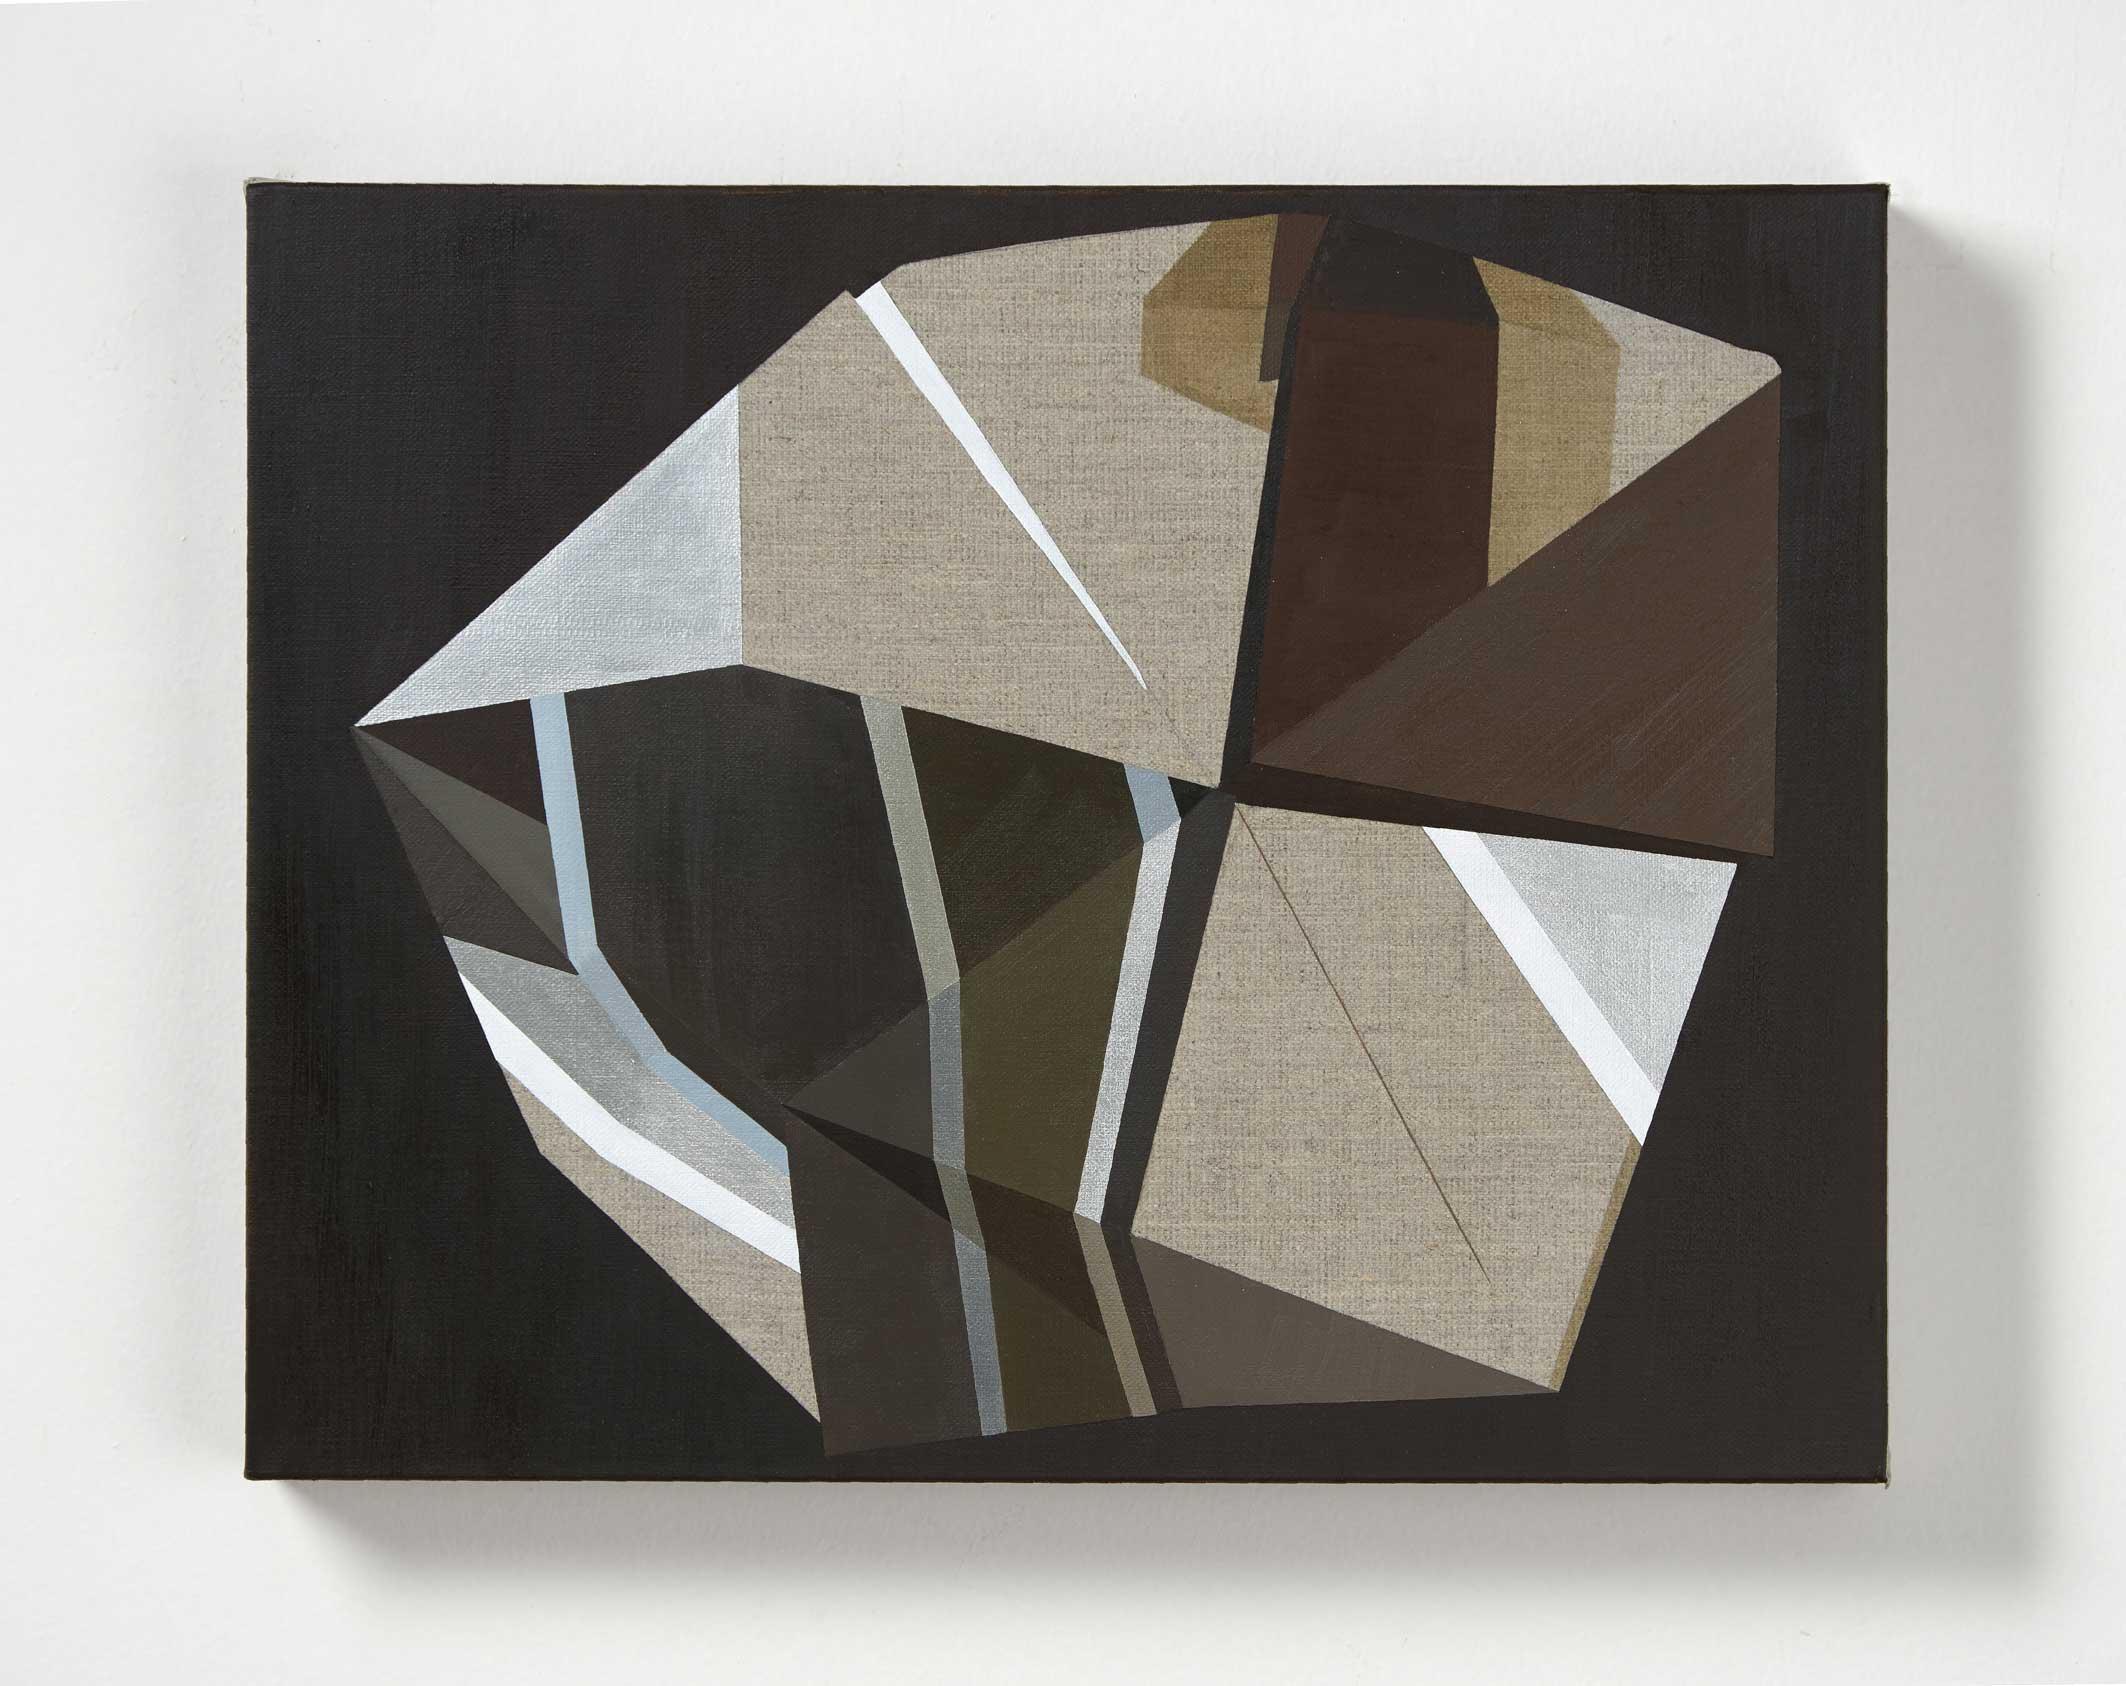 Andrea Eckersley, Partial Umbra, 2017. Oil on linen. 45 x 35xm LR